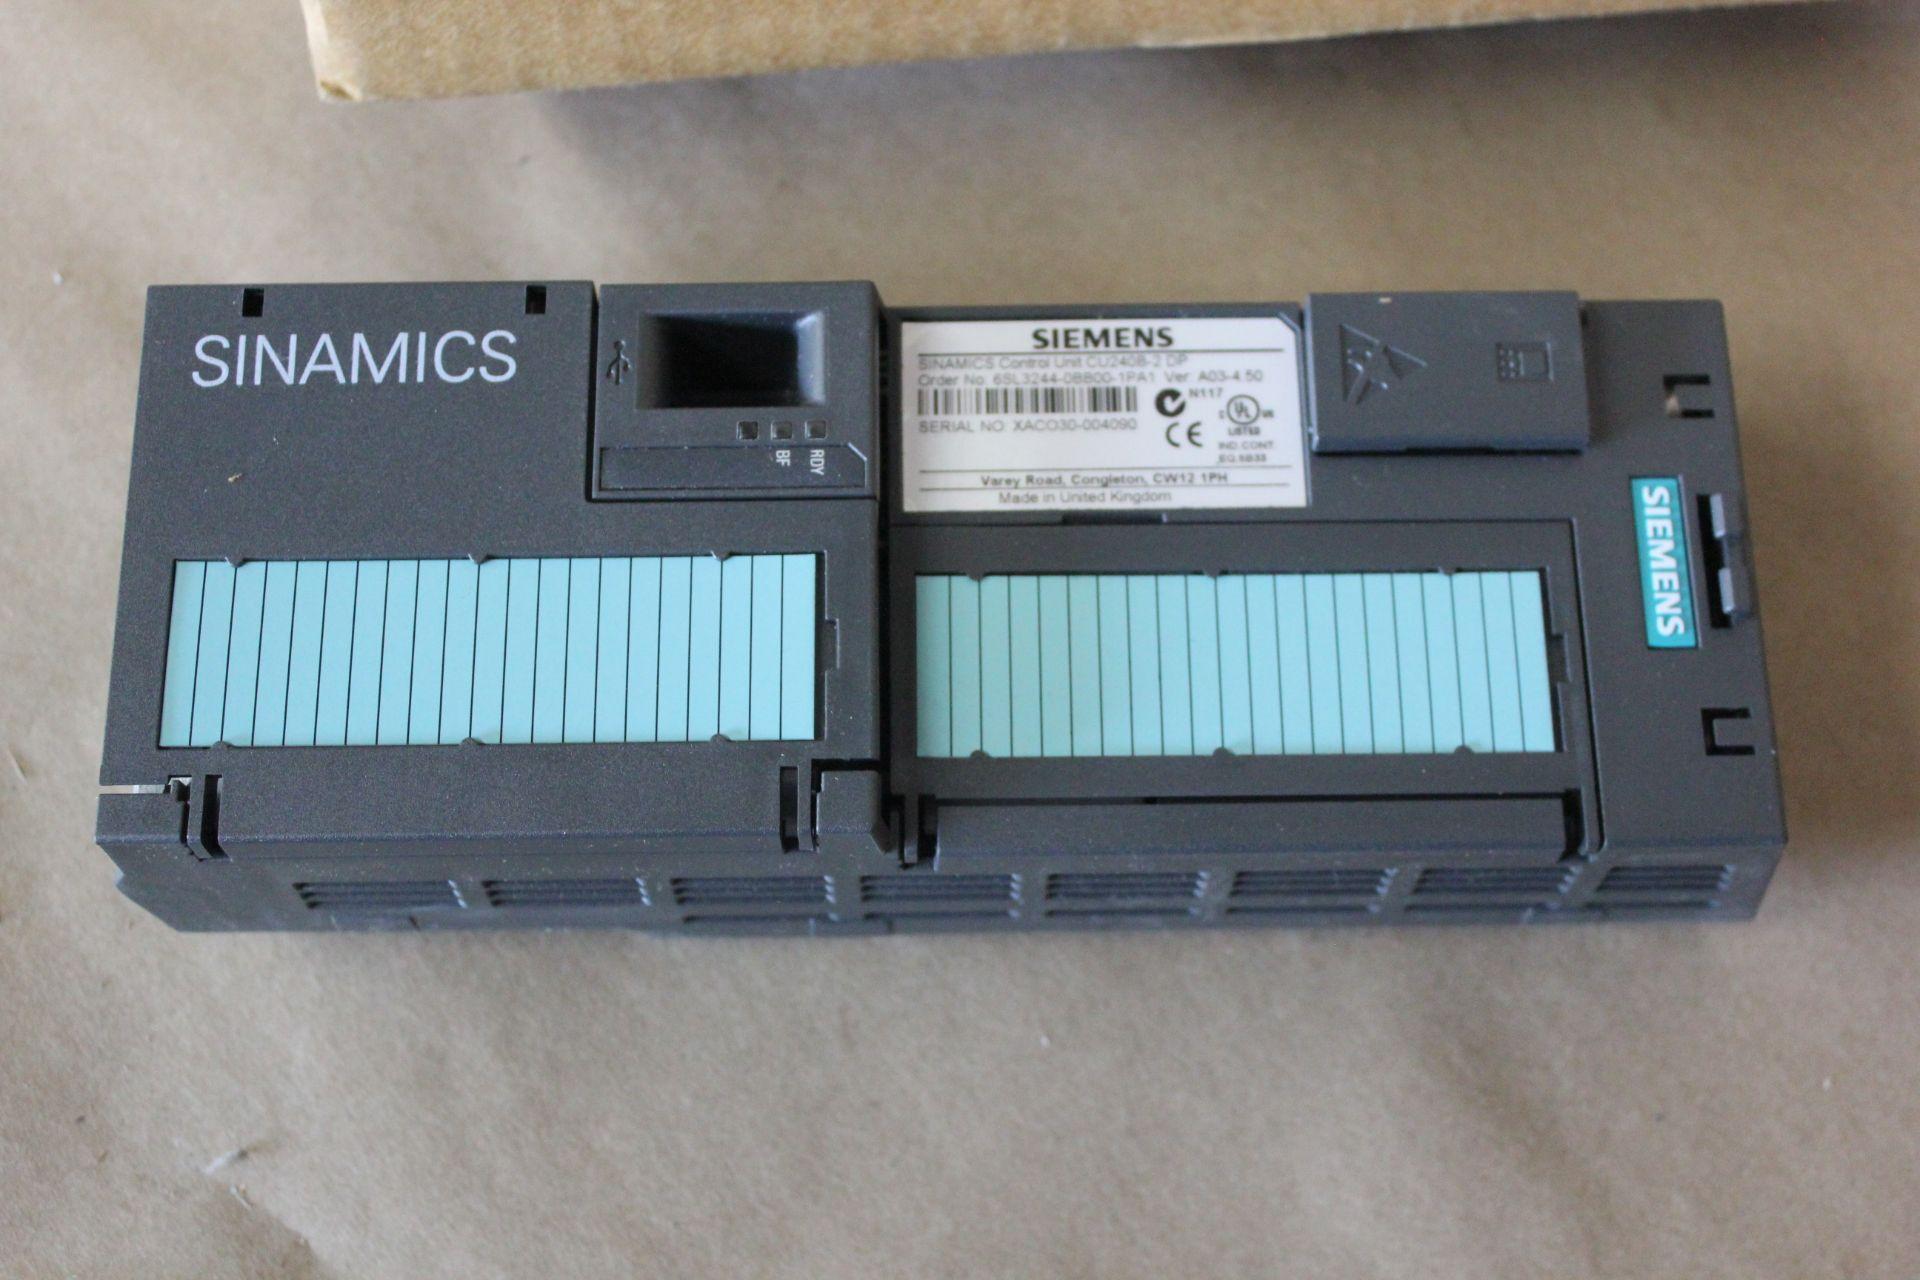 NEW SIEMENS SINAMICS PLC COTROL UNIT - Image 6 of 6